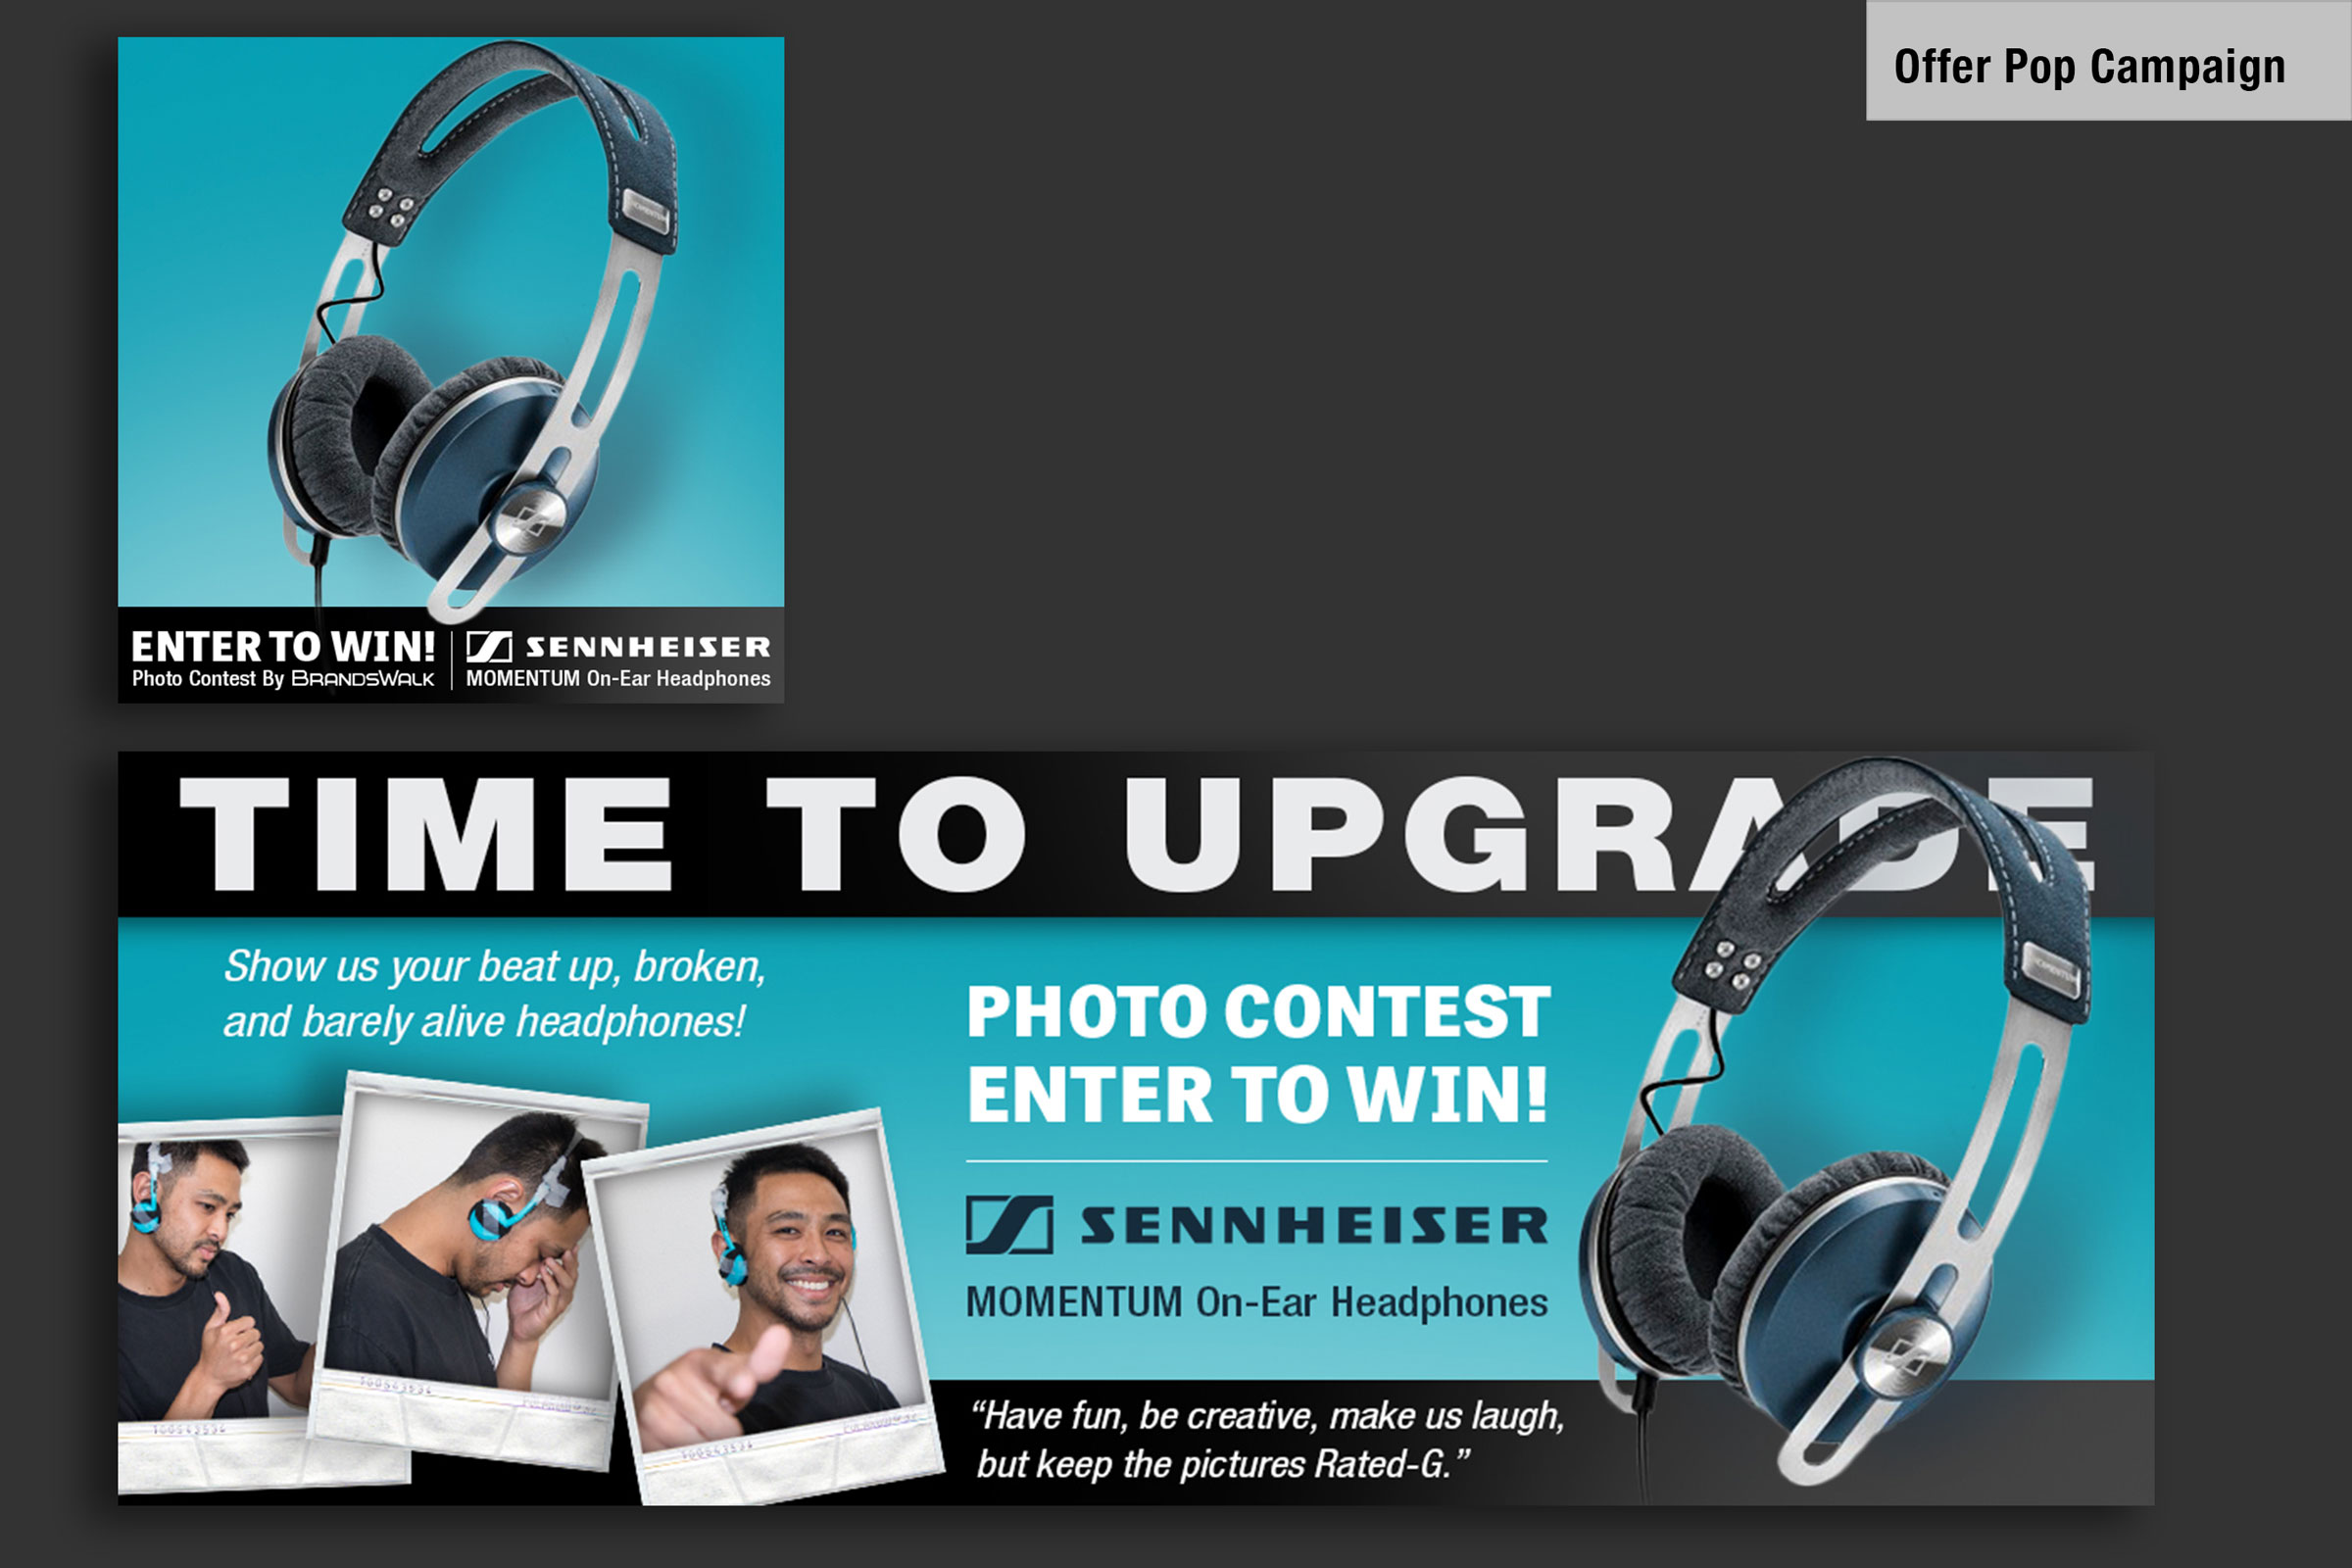 Project   Social Media Marketing   Media Assets   Offer Pop Contest designed for customer aquisition